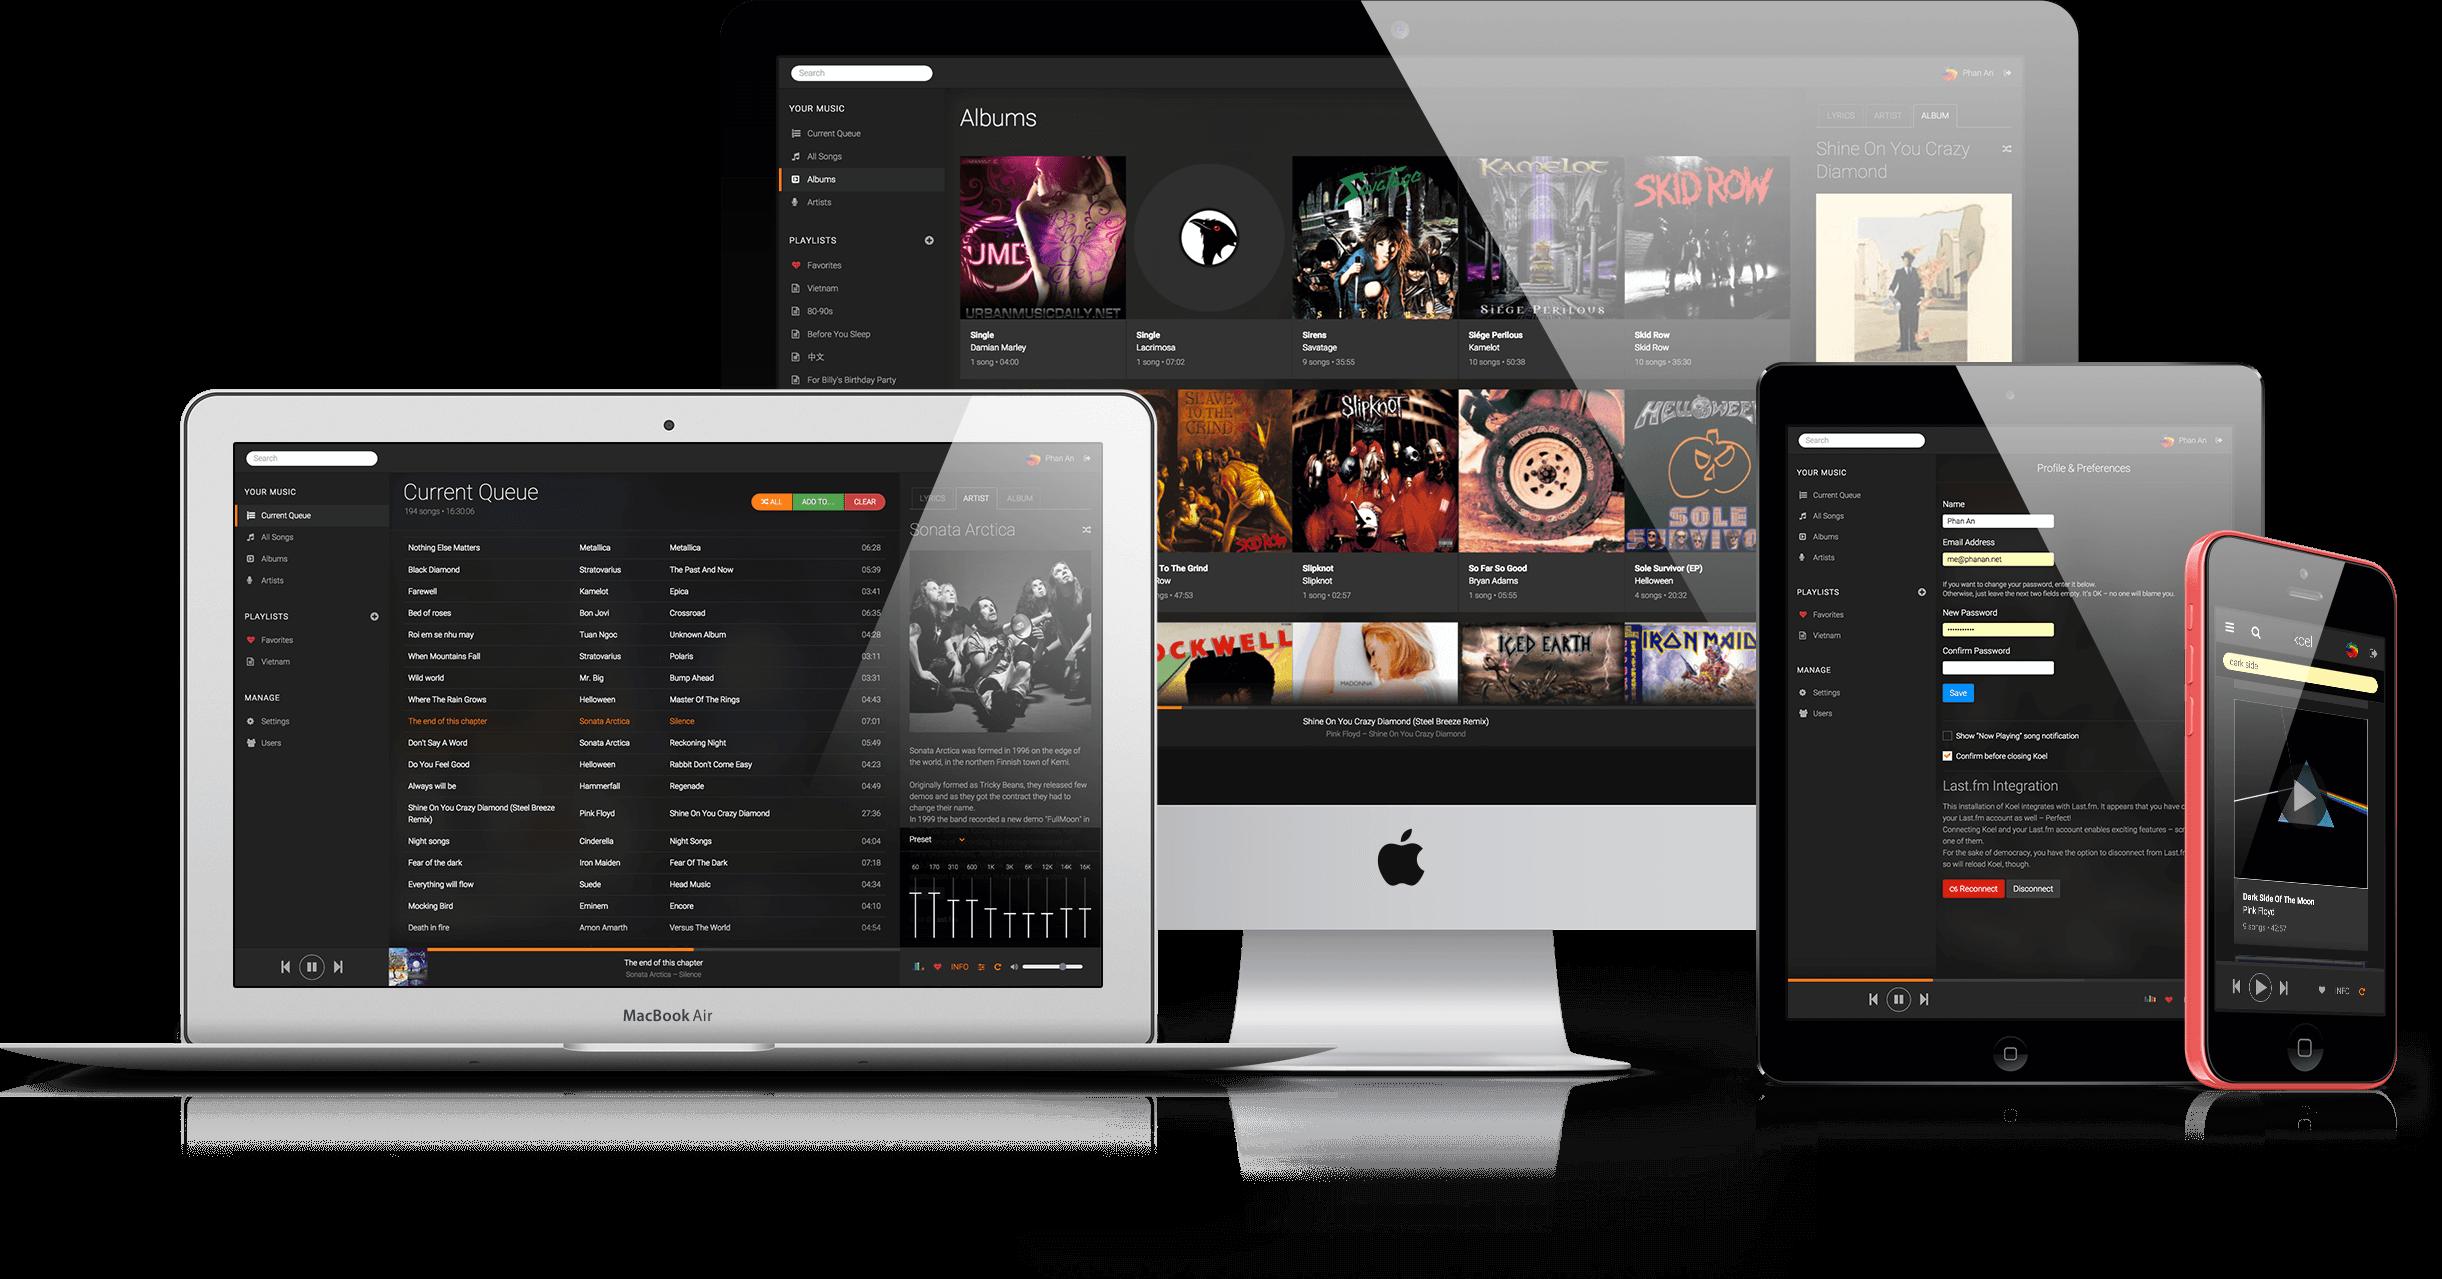 GitHub - phanan/koel: 🐦 A personal music streaming server that works